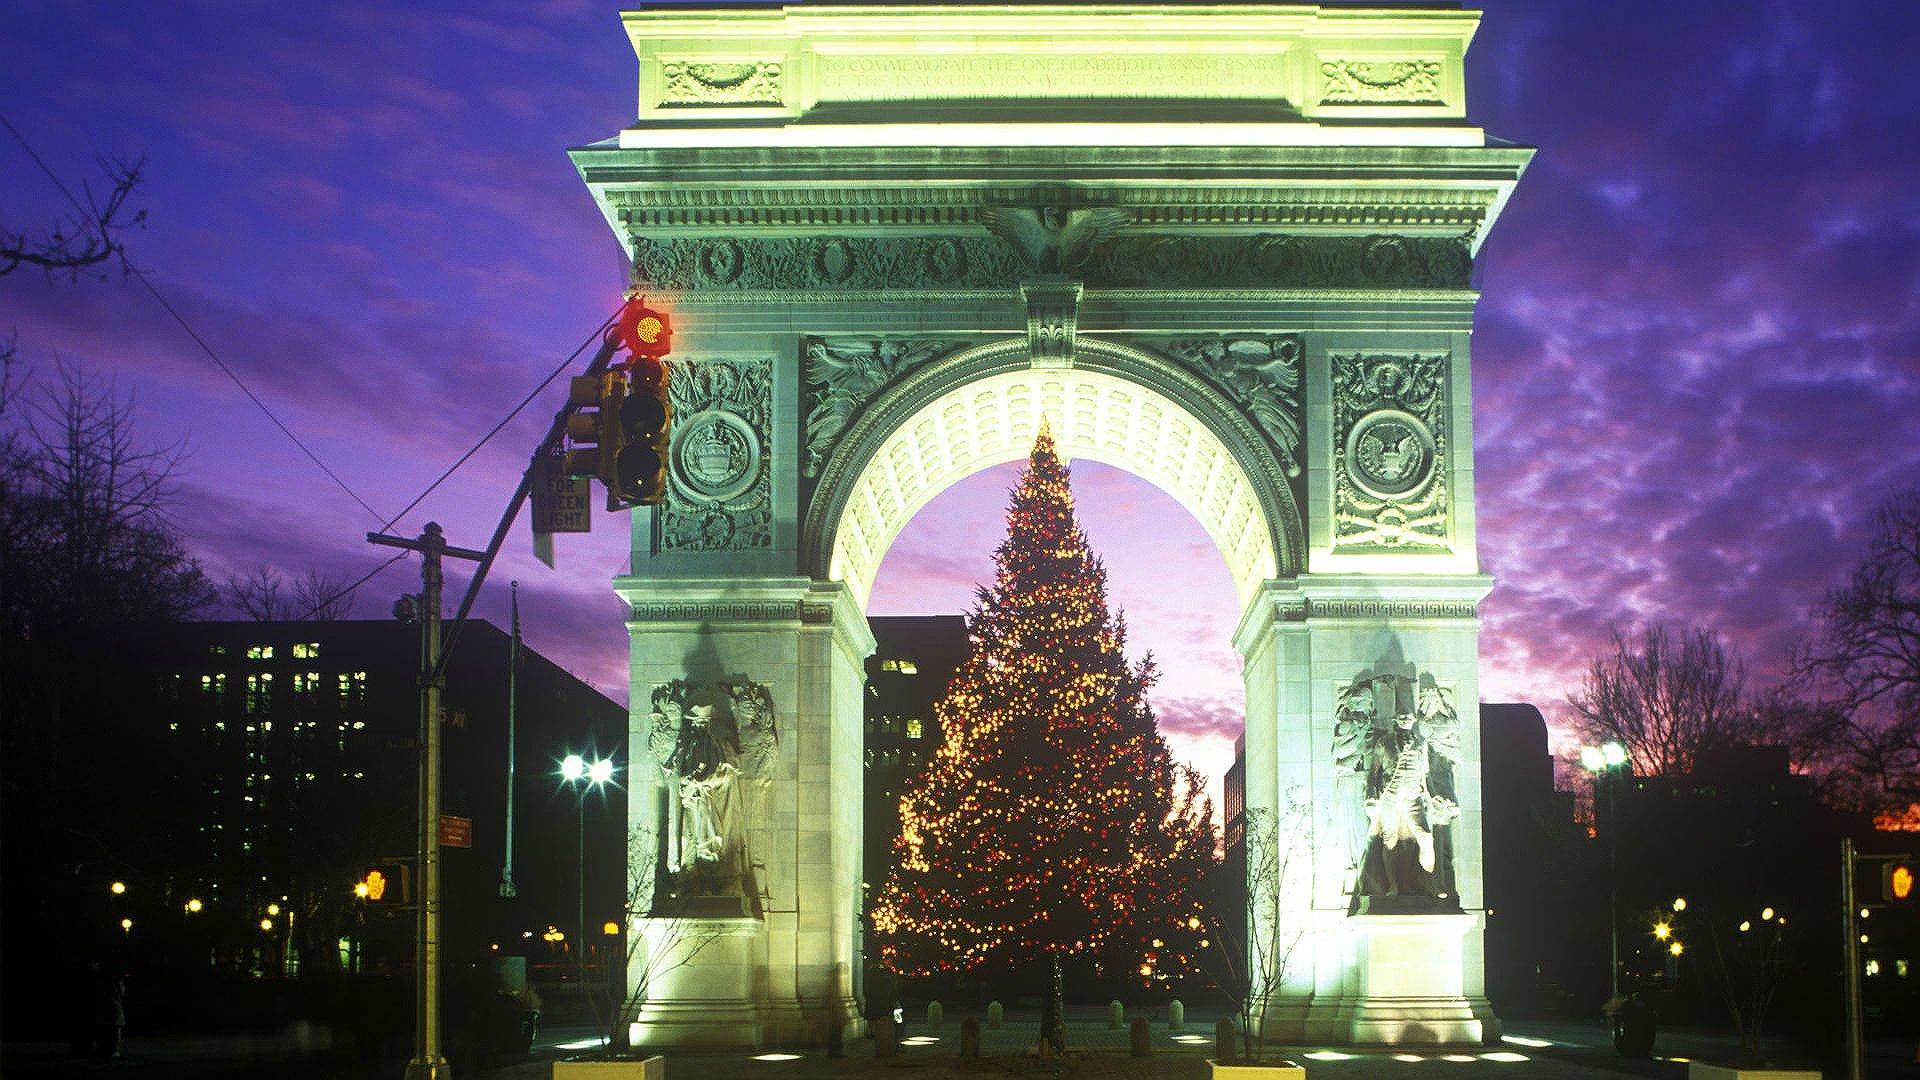 Did You Know Washington Square Parks Christmas Tree Arrives on